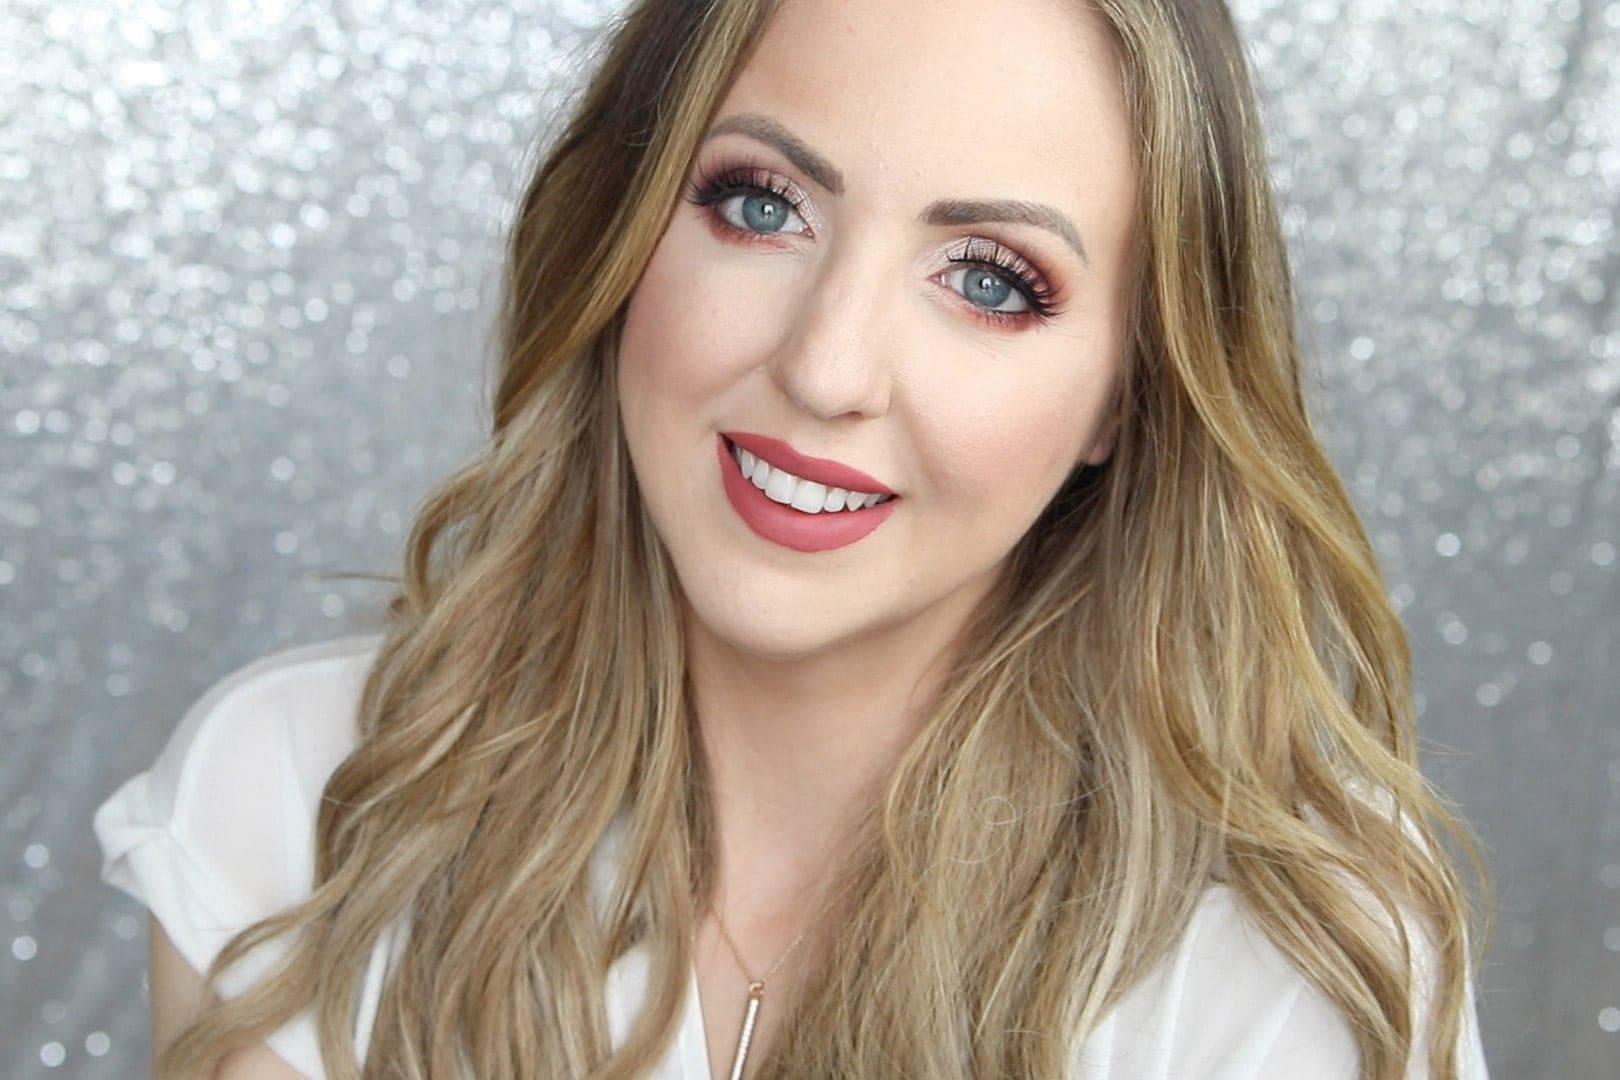 EyeShadow Tutorial with the ABH Modern Renaissance Palette by Houston beauty blogger Meg O. on the Go